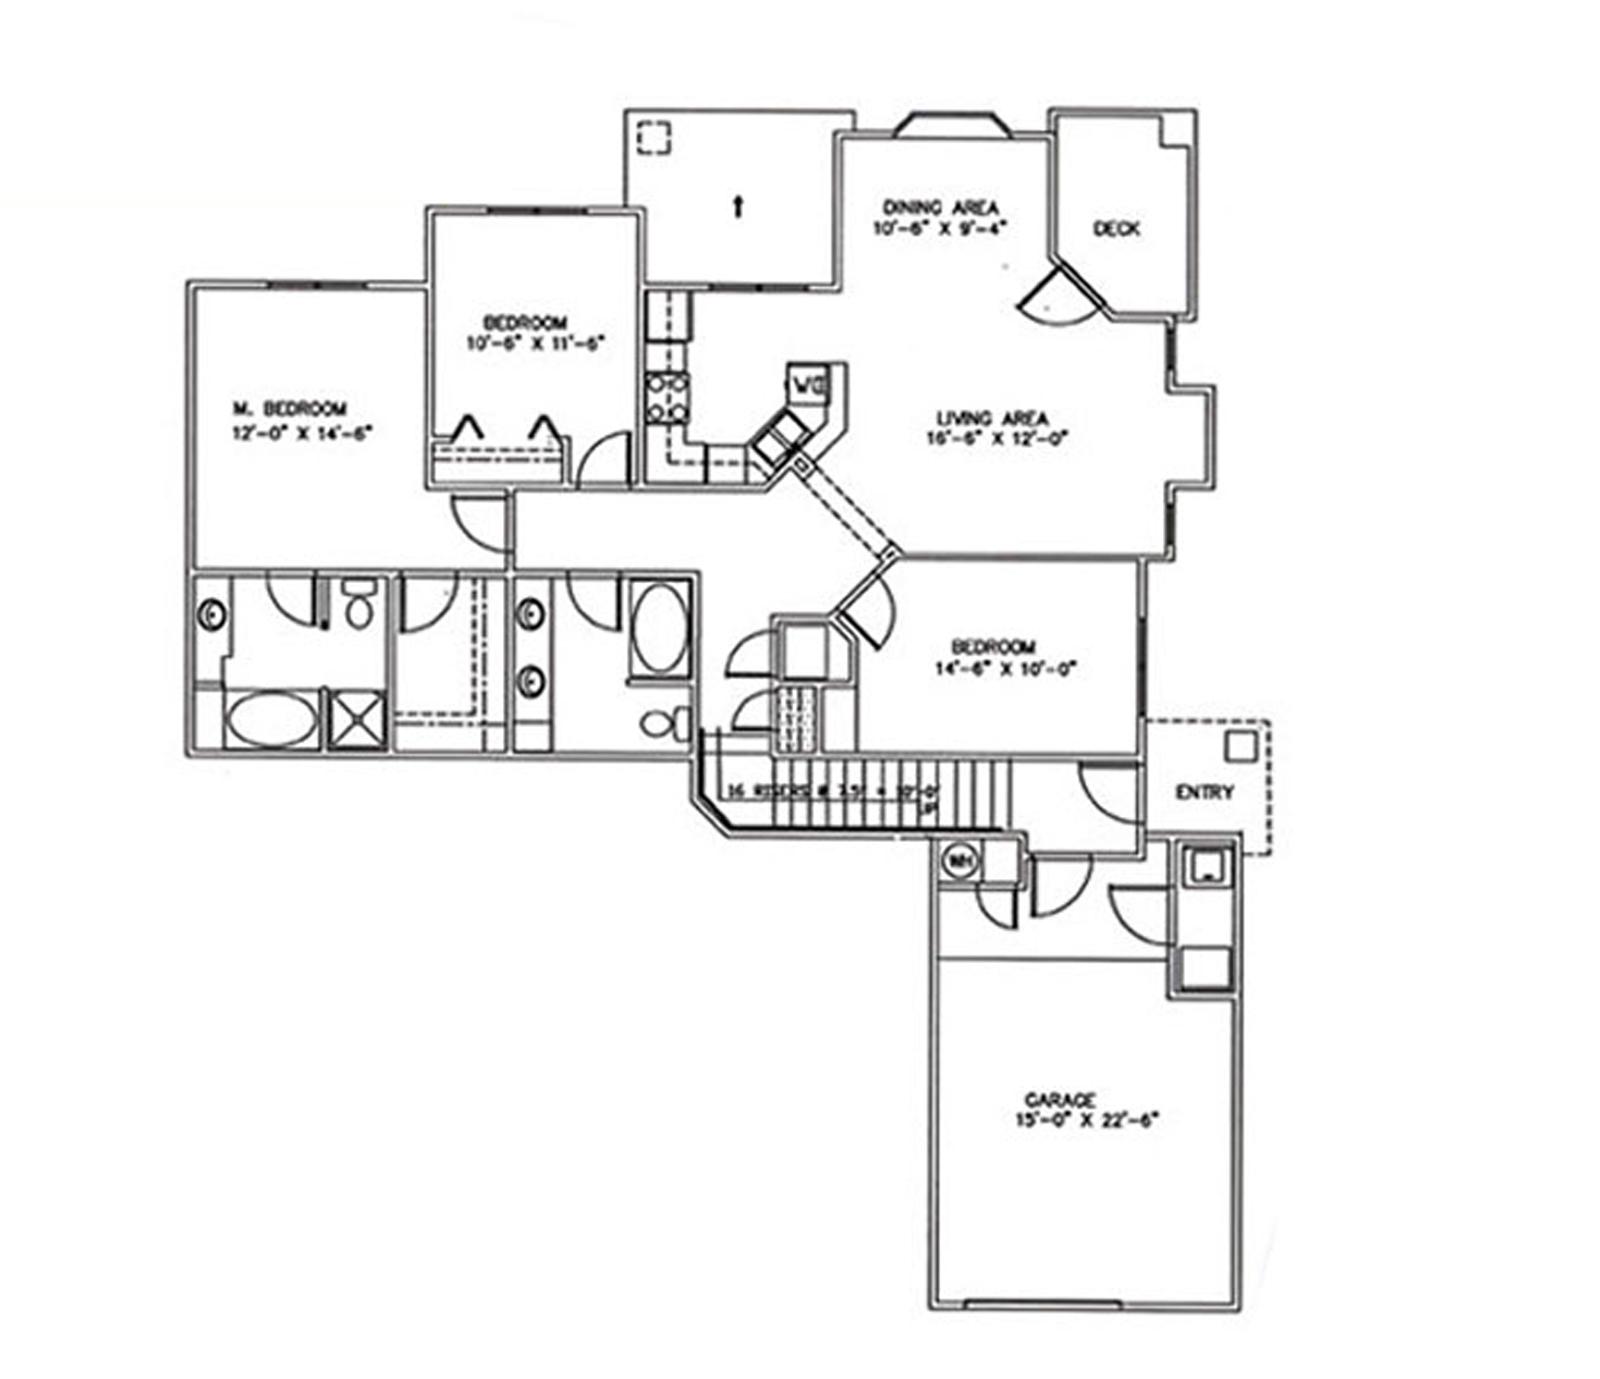 3 Bedrooms, 2 Baths, 1 Car Garage